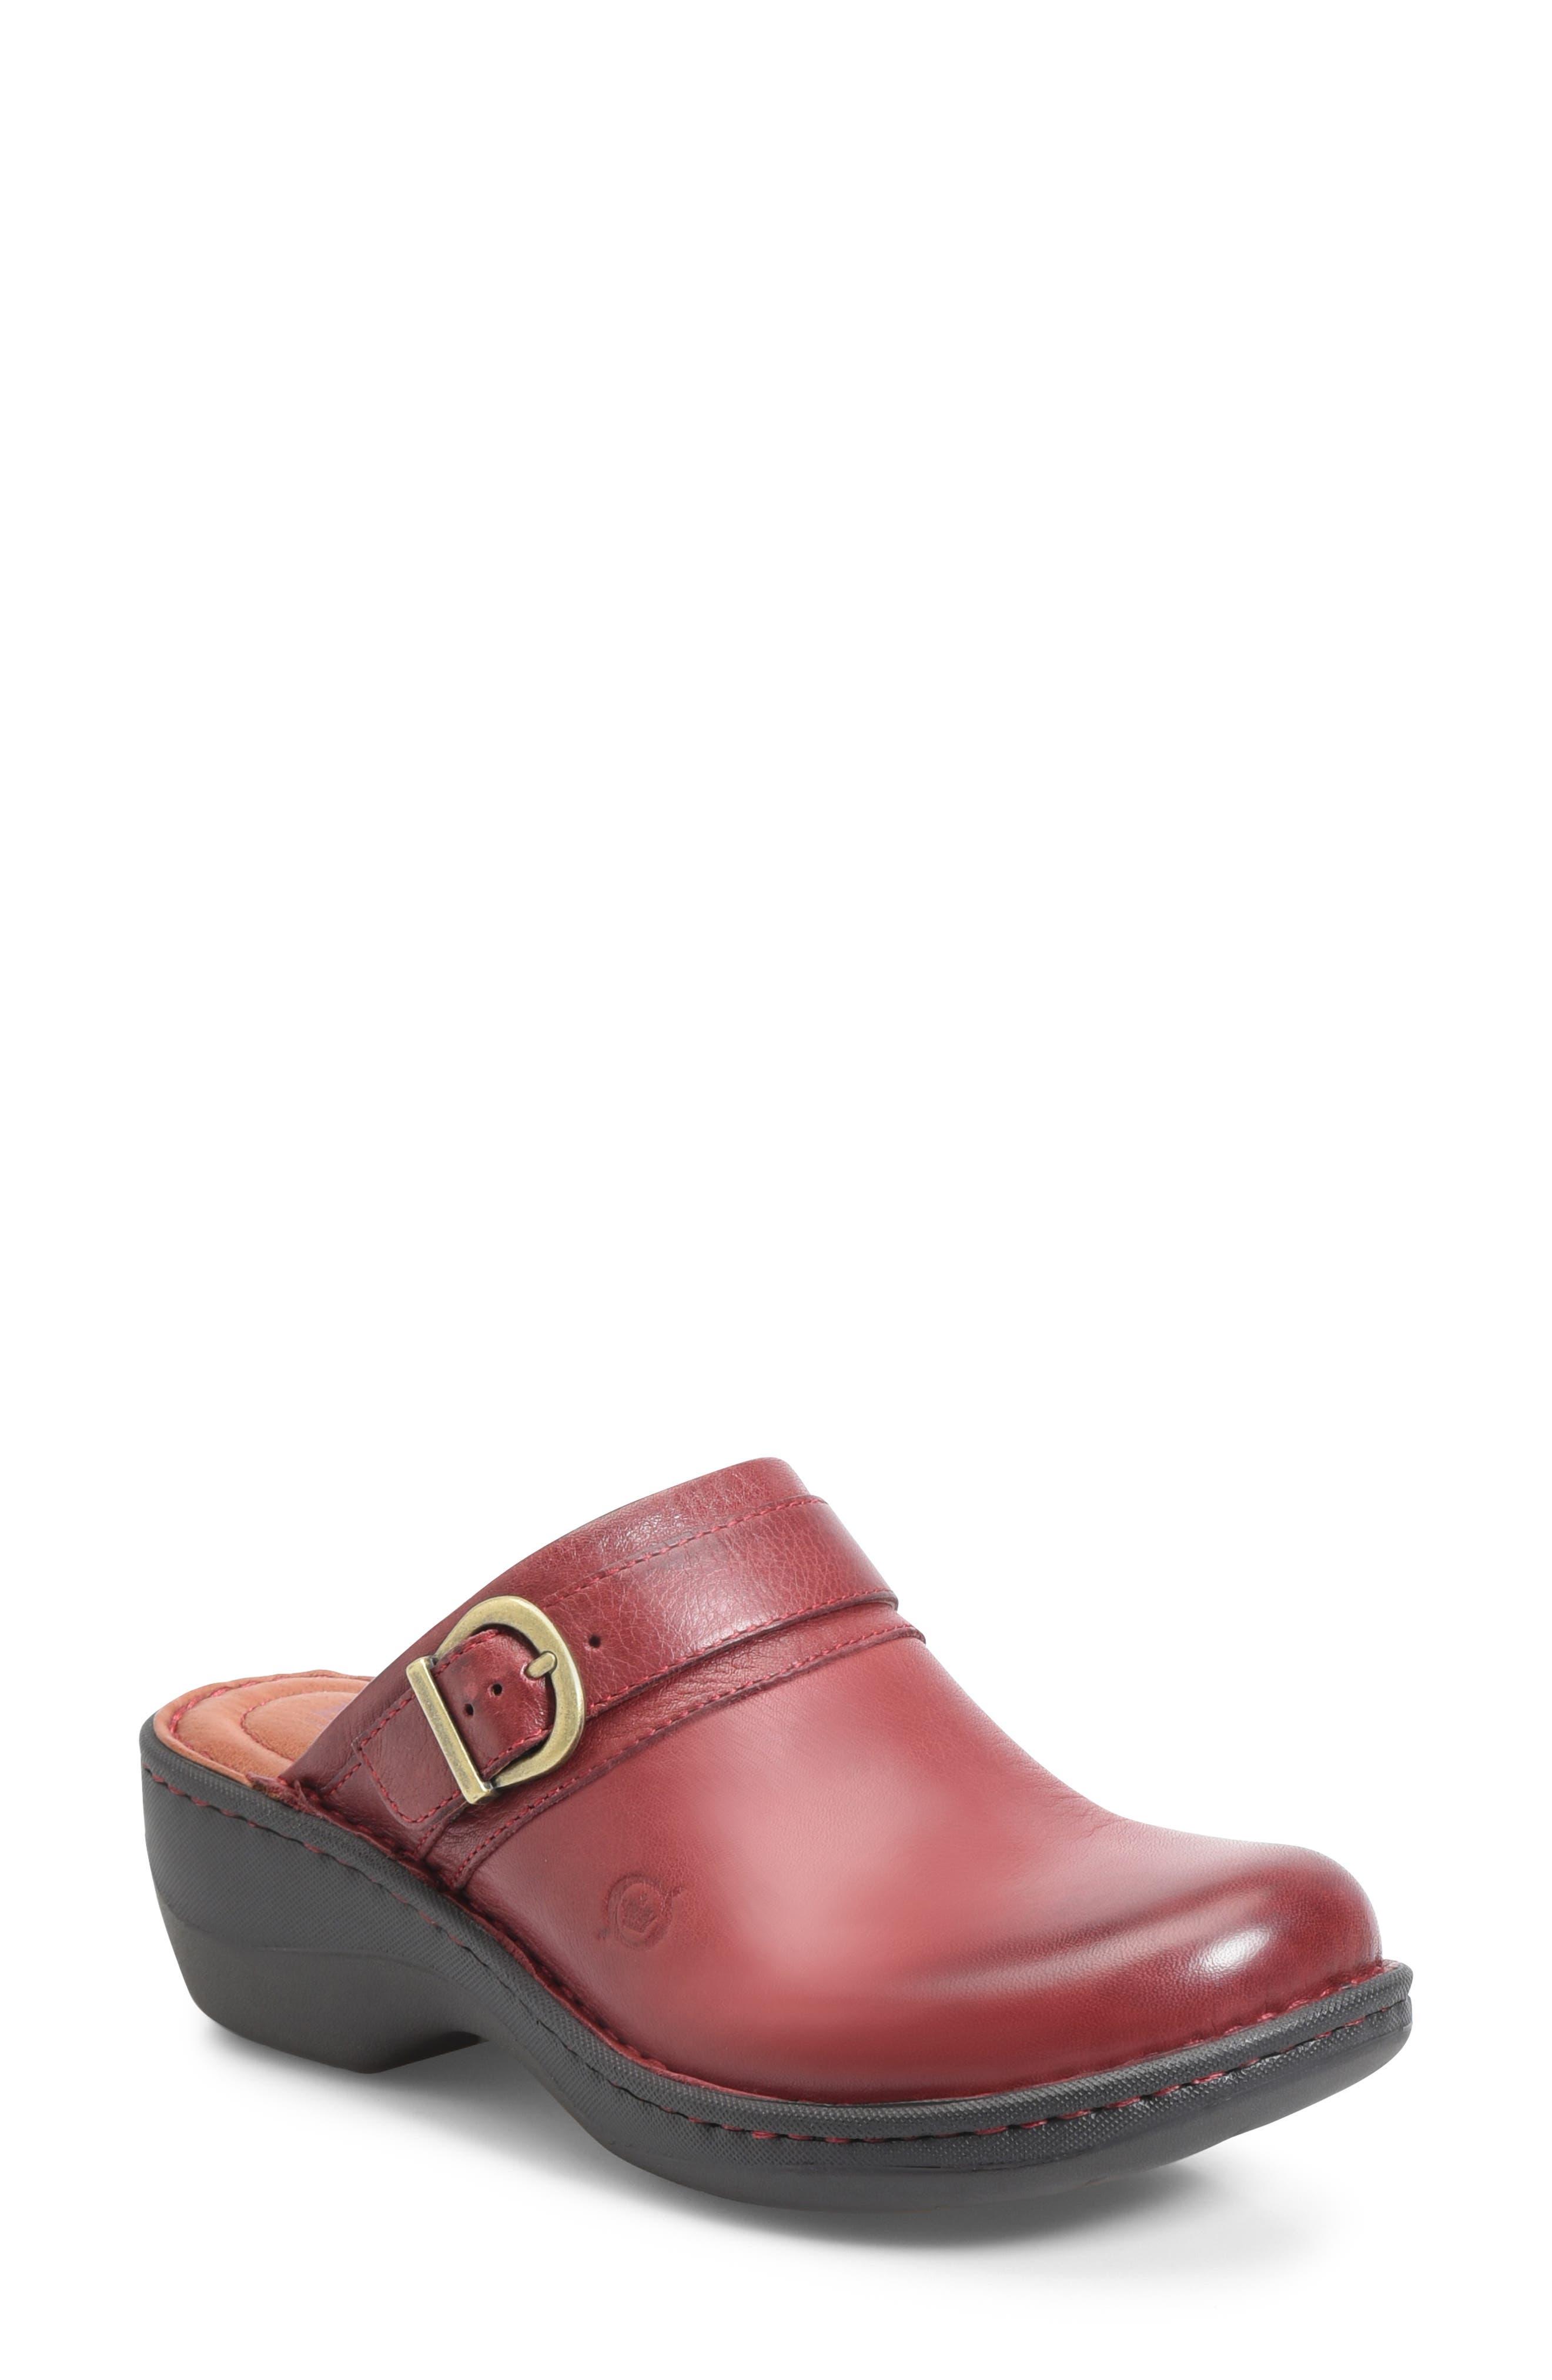 fb531338b Born Women's Shoes